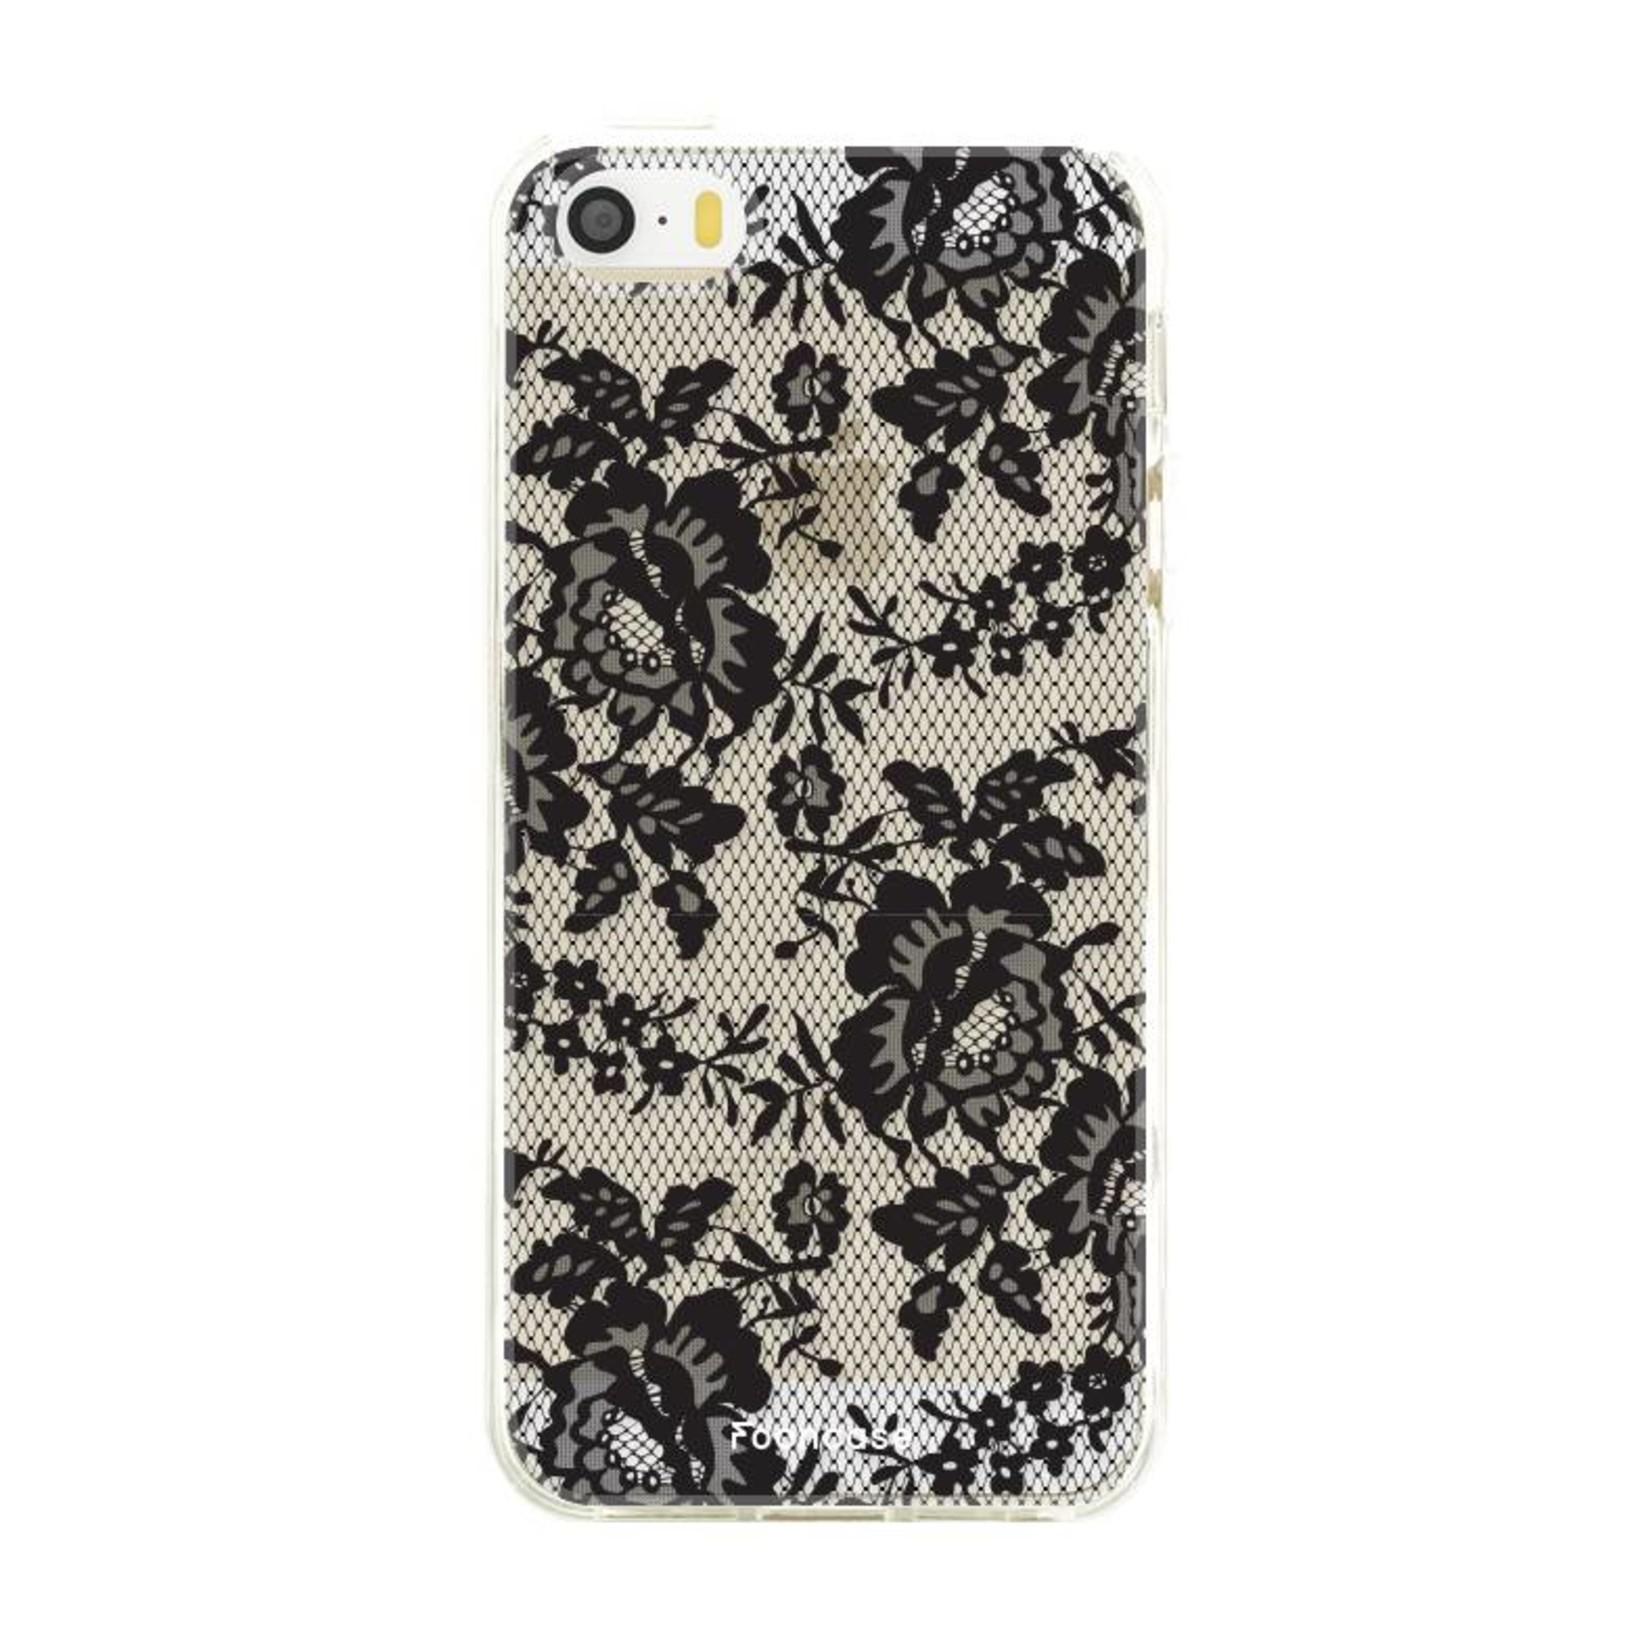 FOONCASE Iphone 5 / 5S Handyhülle - Secret